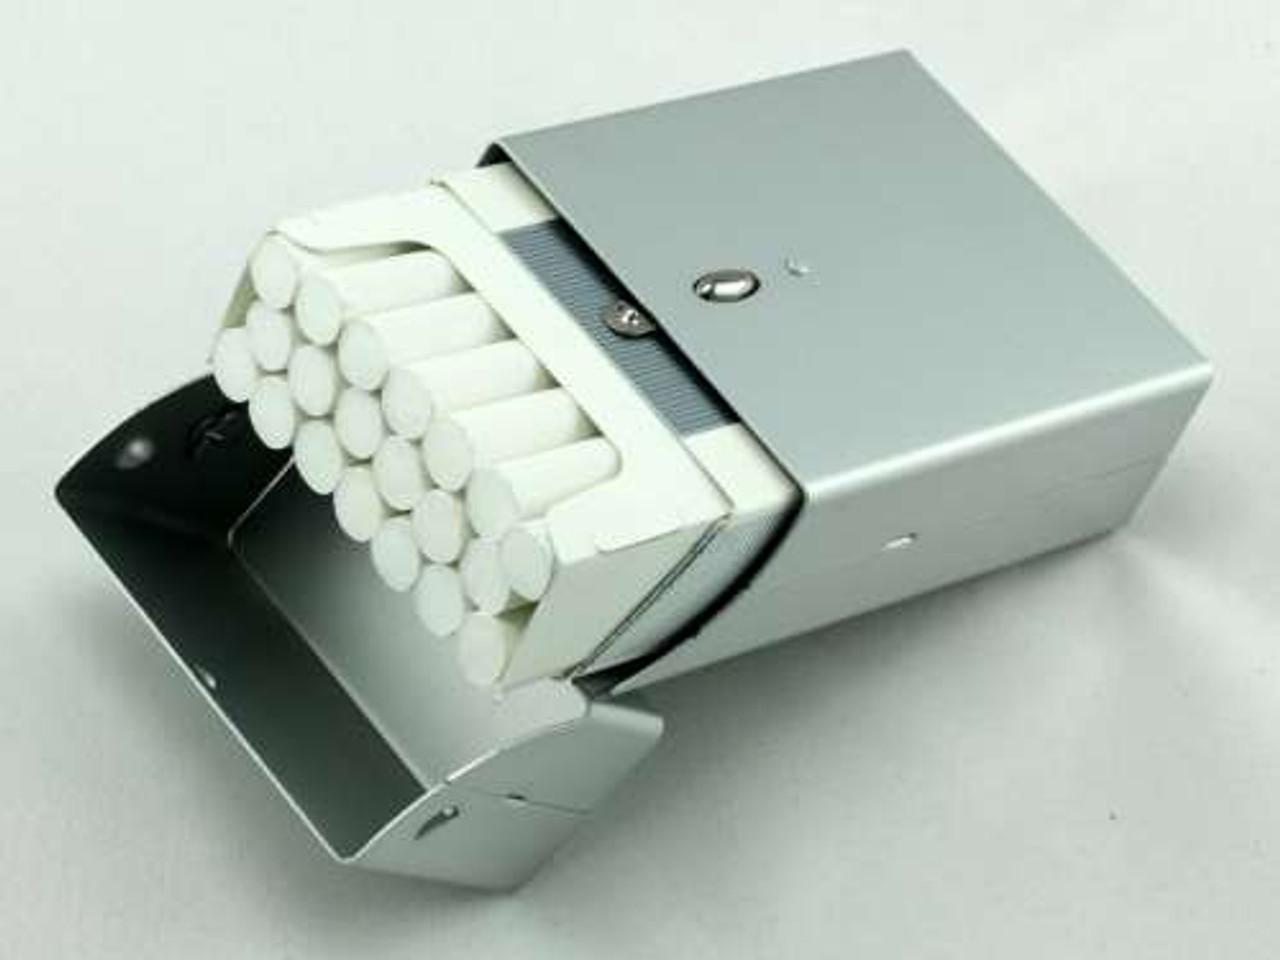 Satin Silver Cigarette Pack Holder